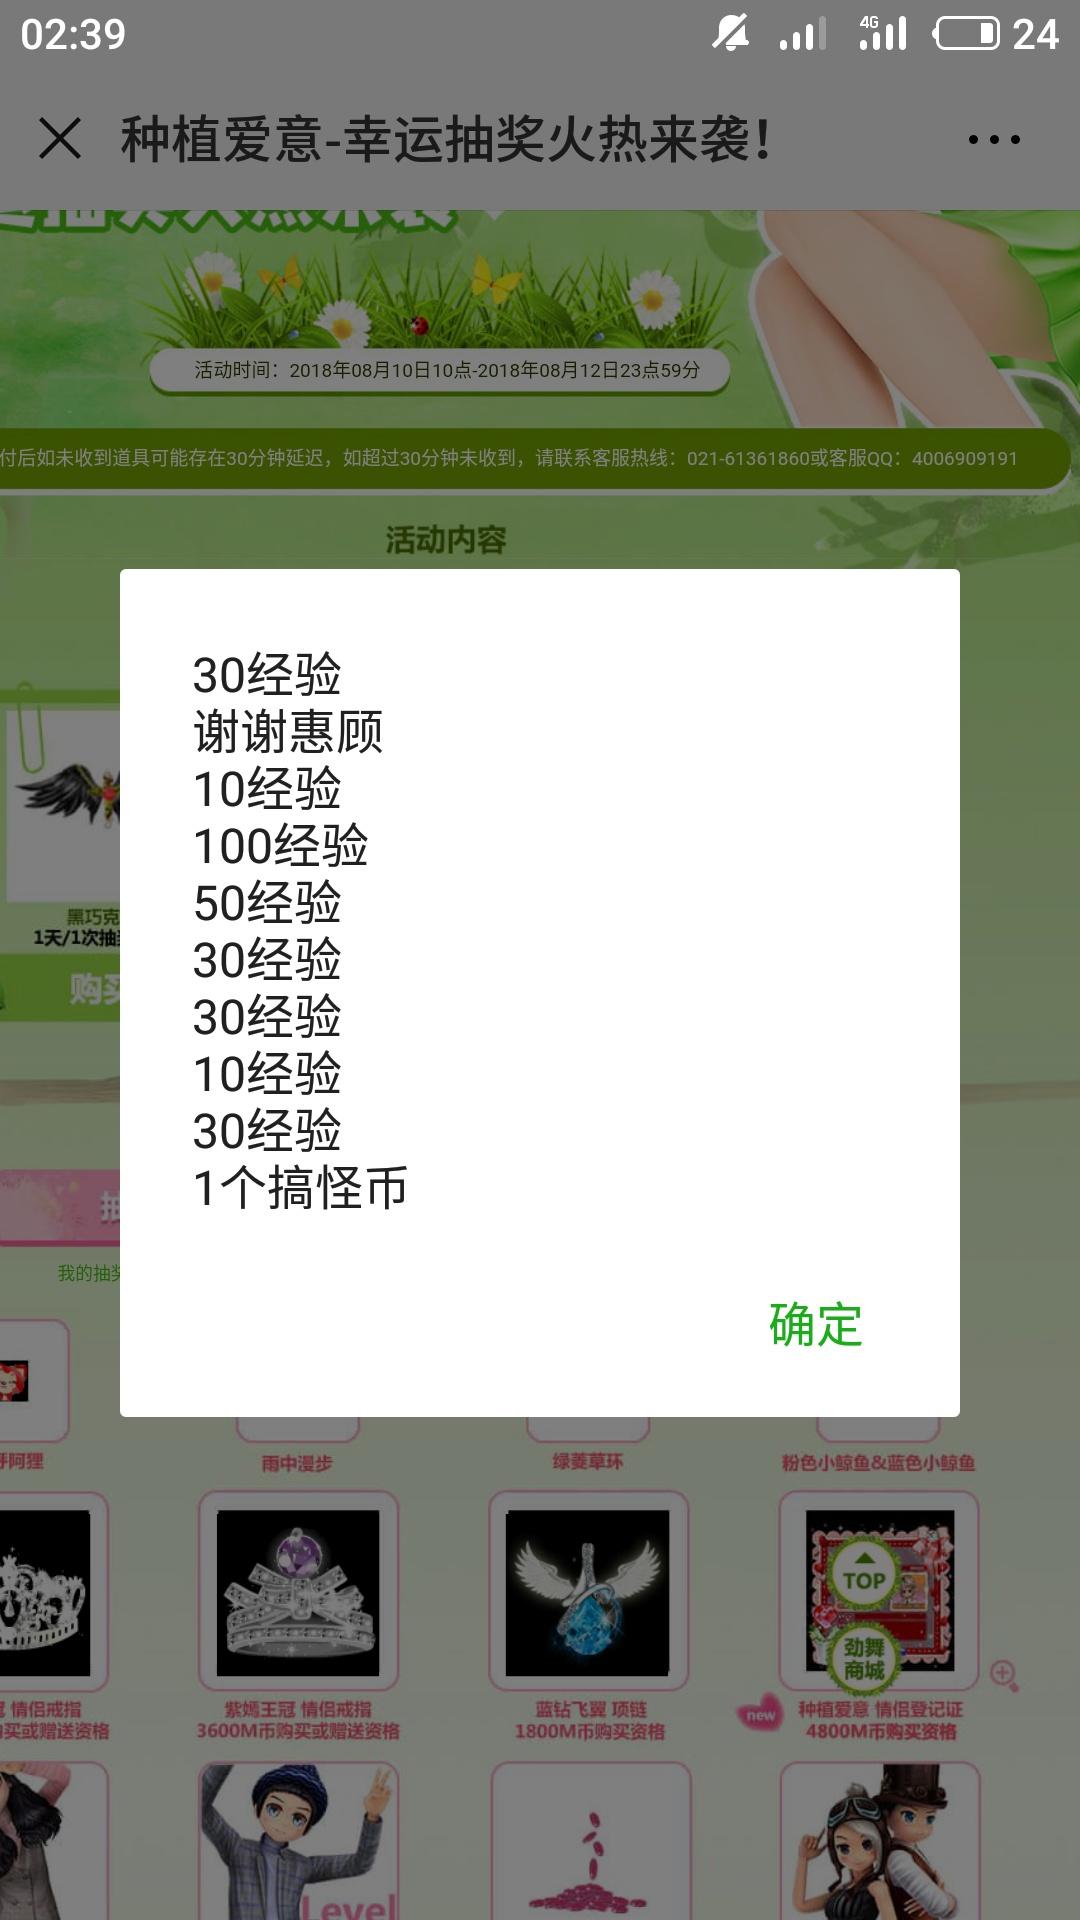 S80811-023916.jpg